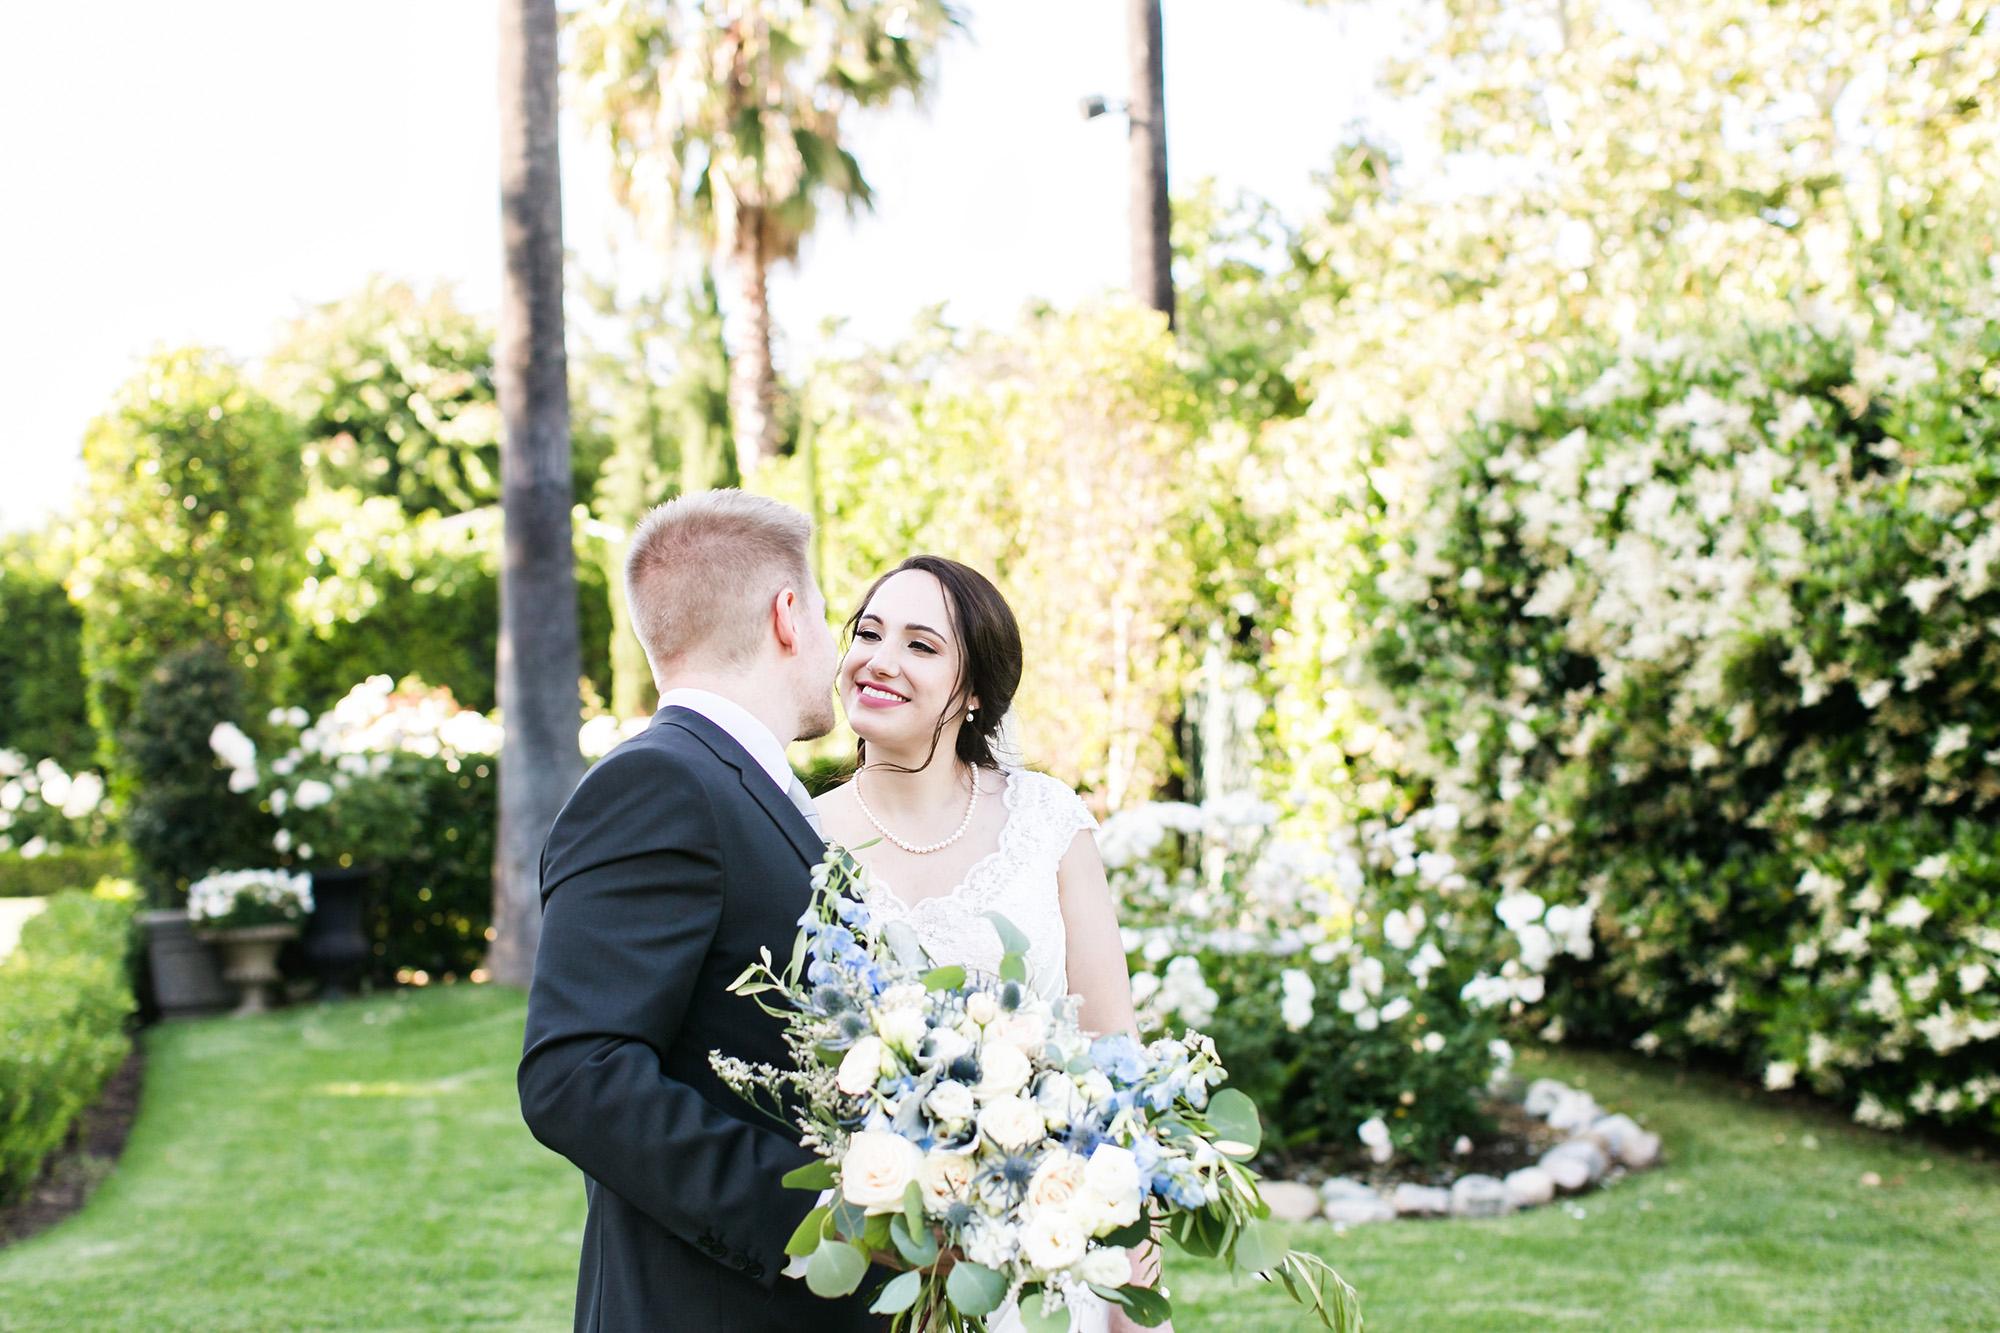 associate-photographer-christmas-house-wedding-carrie-vines-0102.jpg